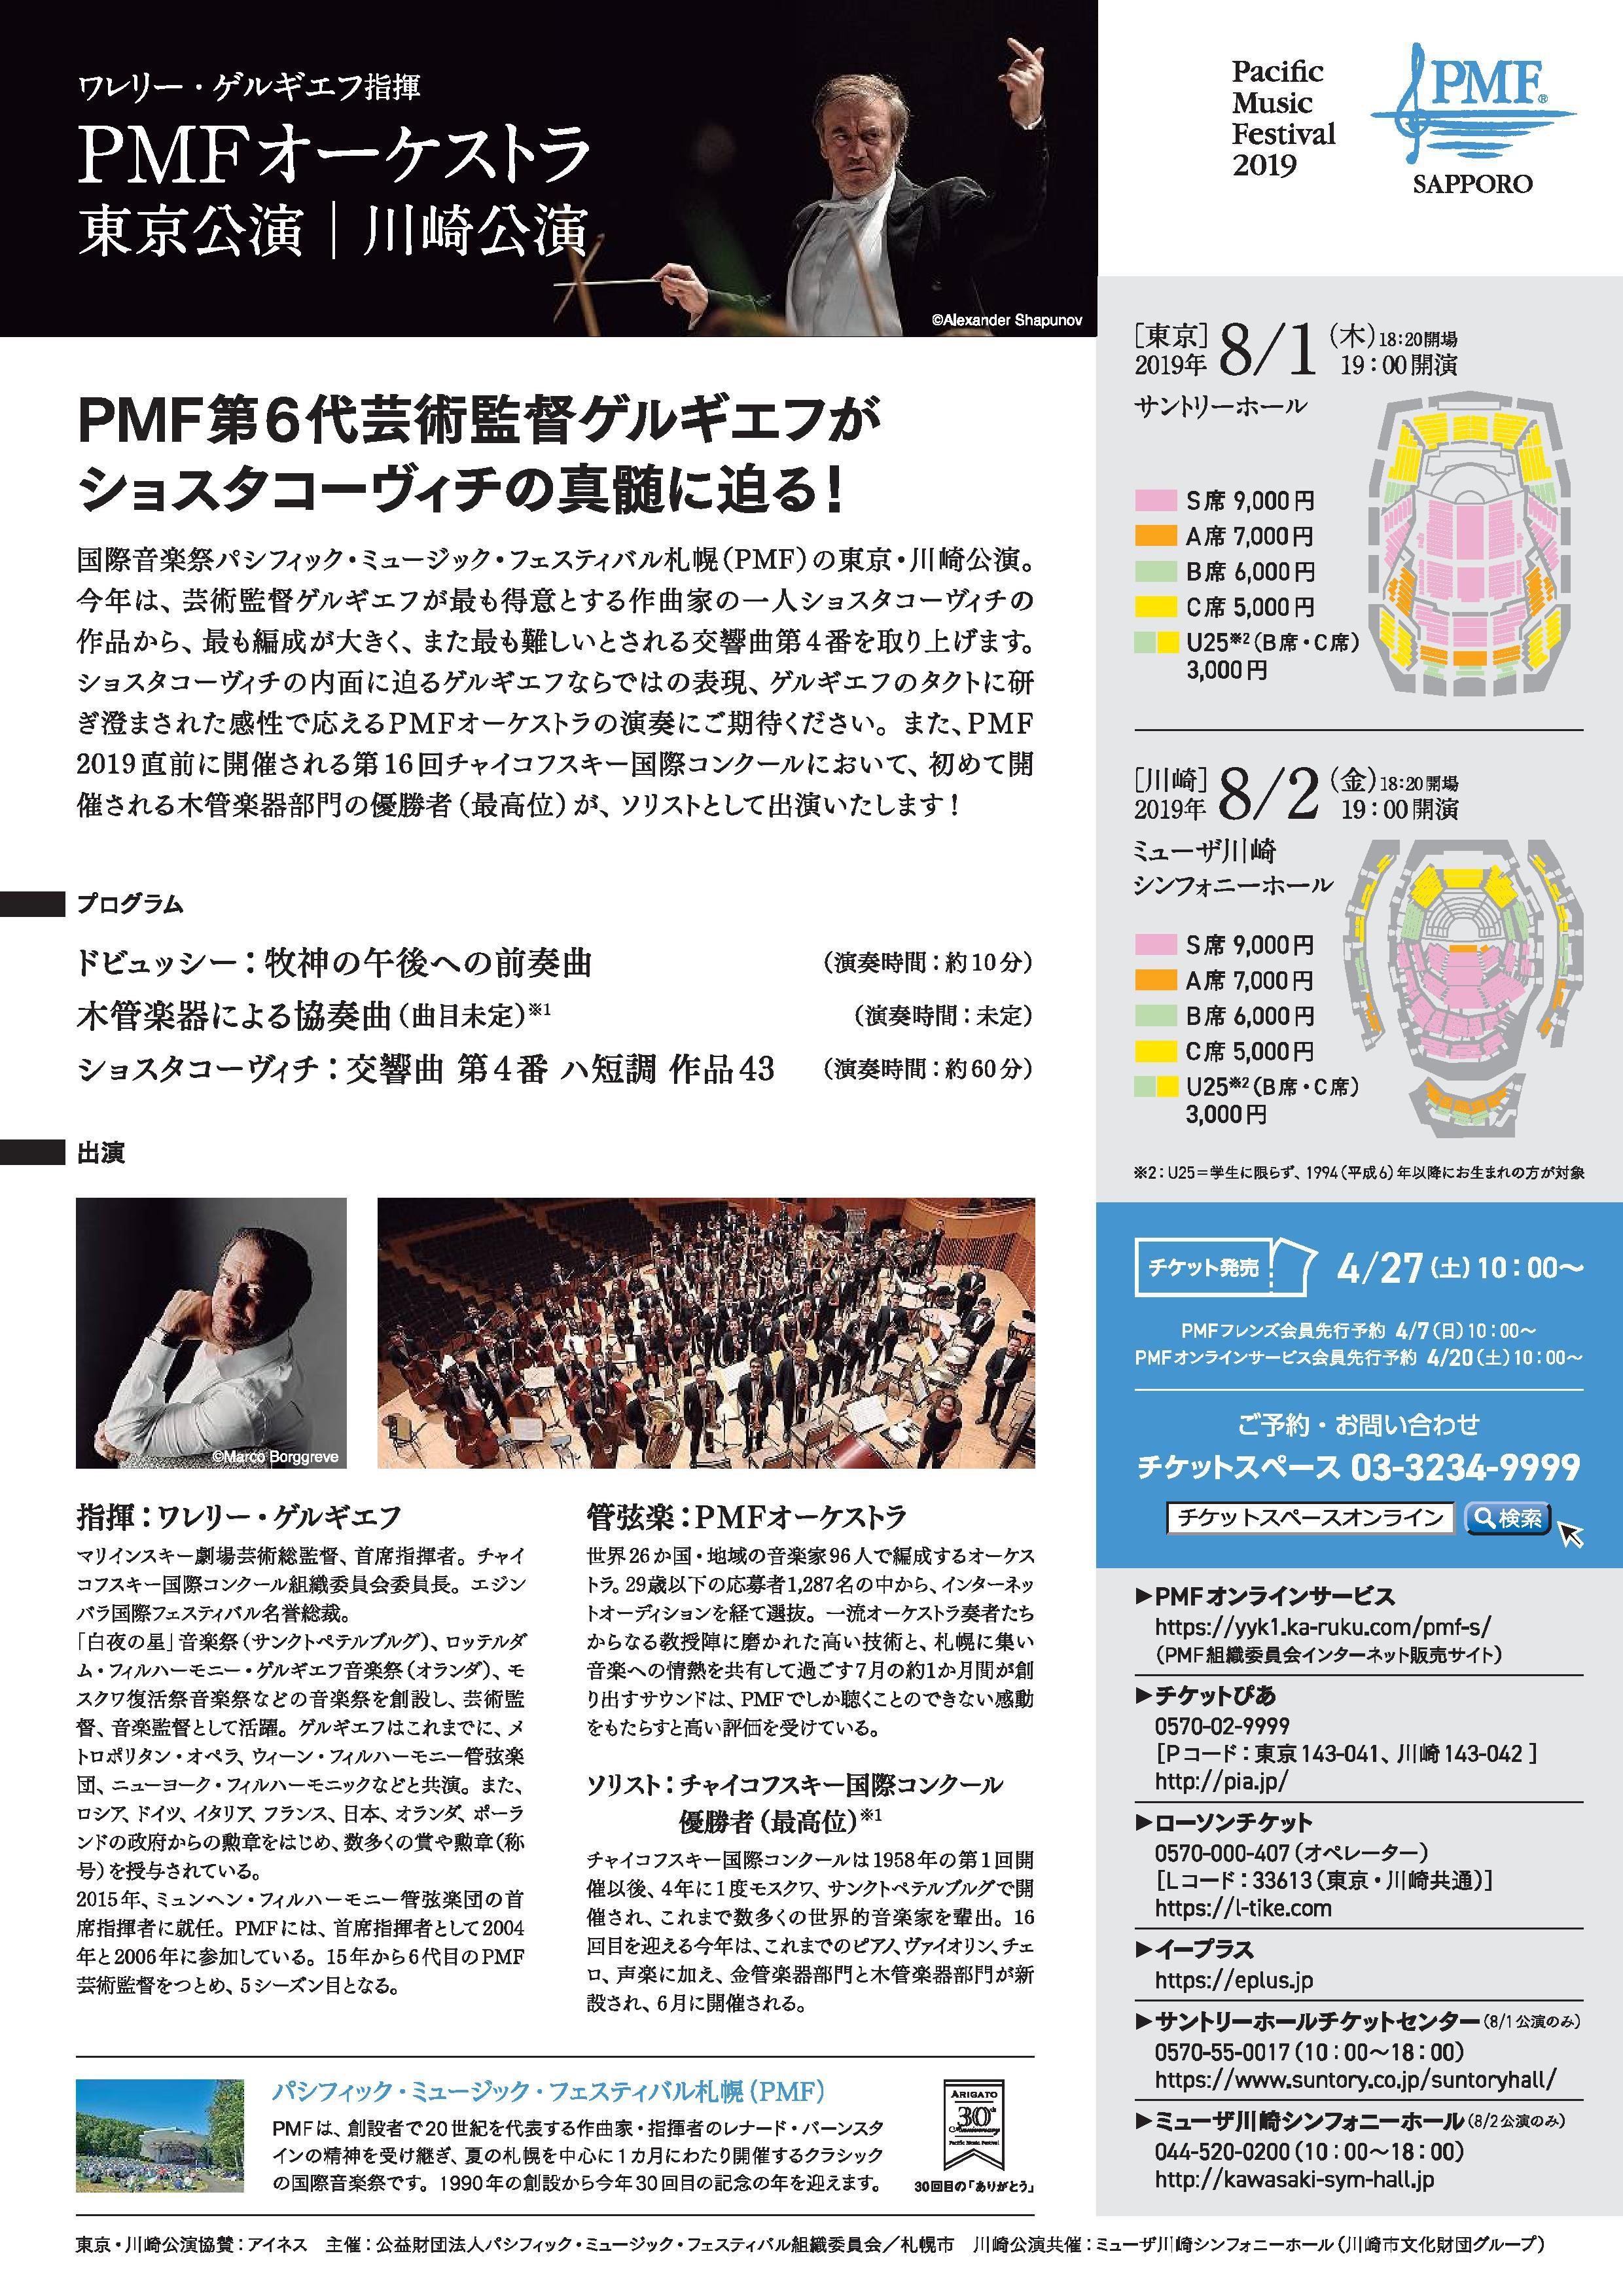 PMFオーケストラ東京・川崎公演チラシ 2枚目